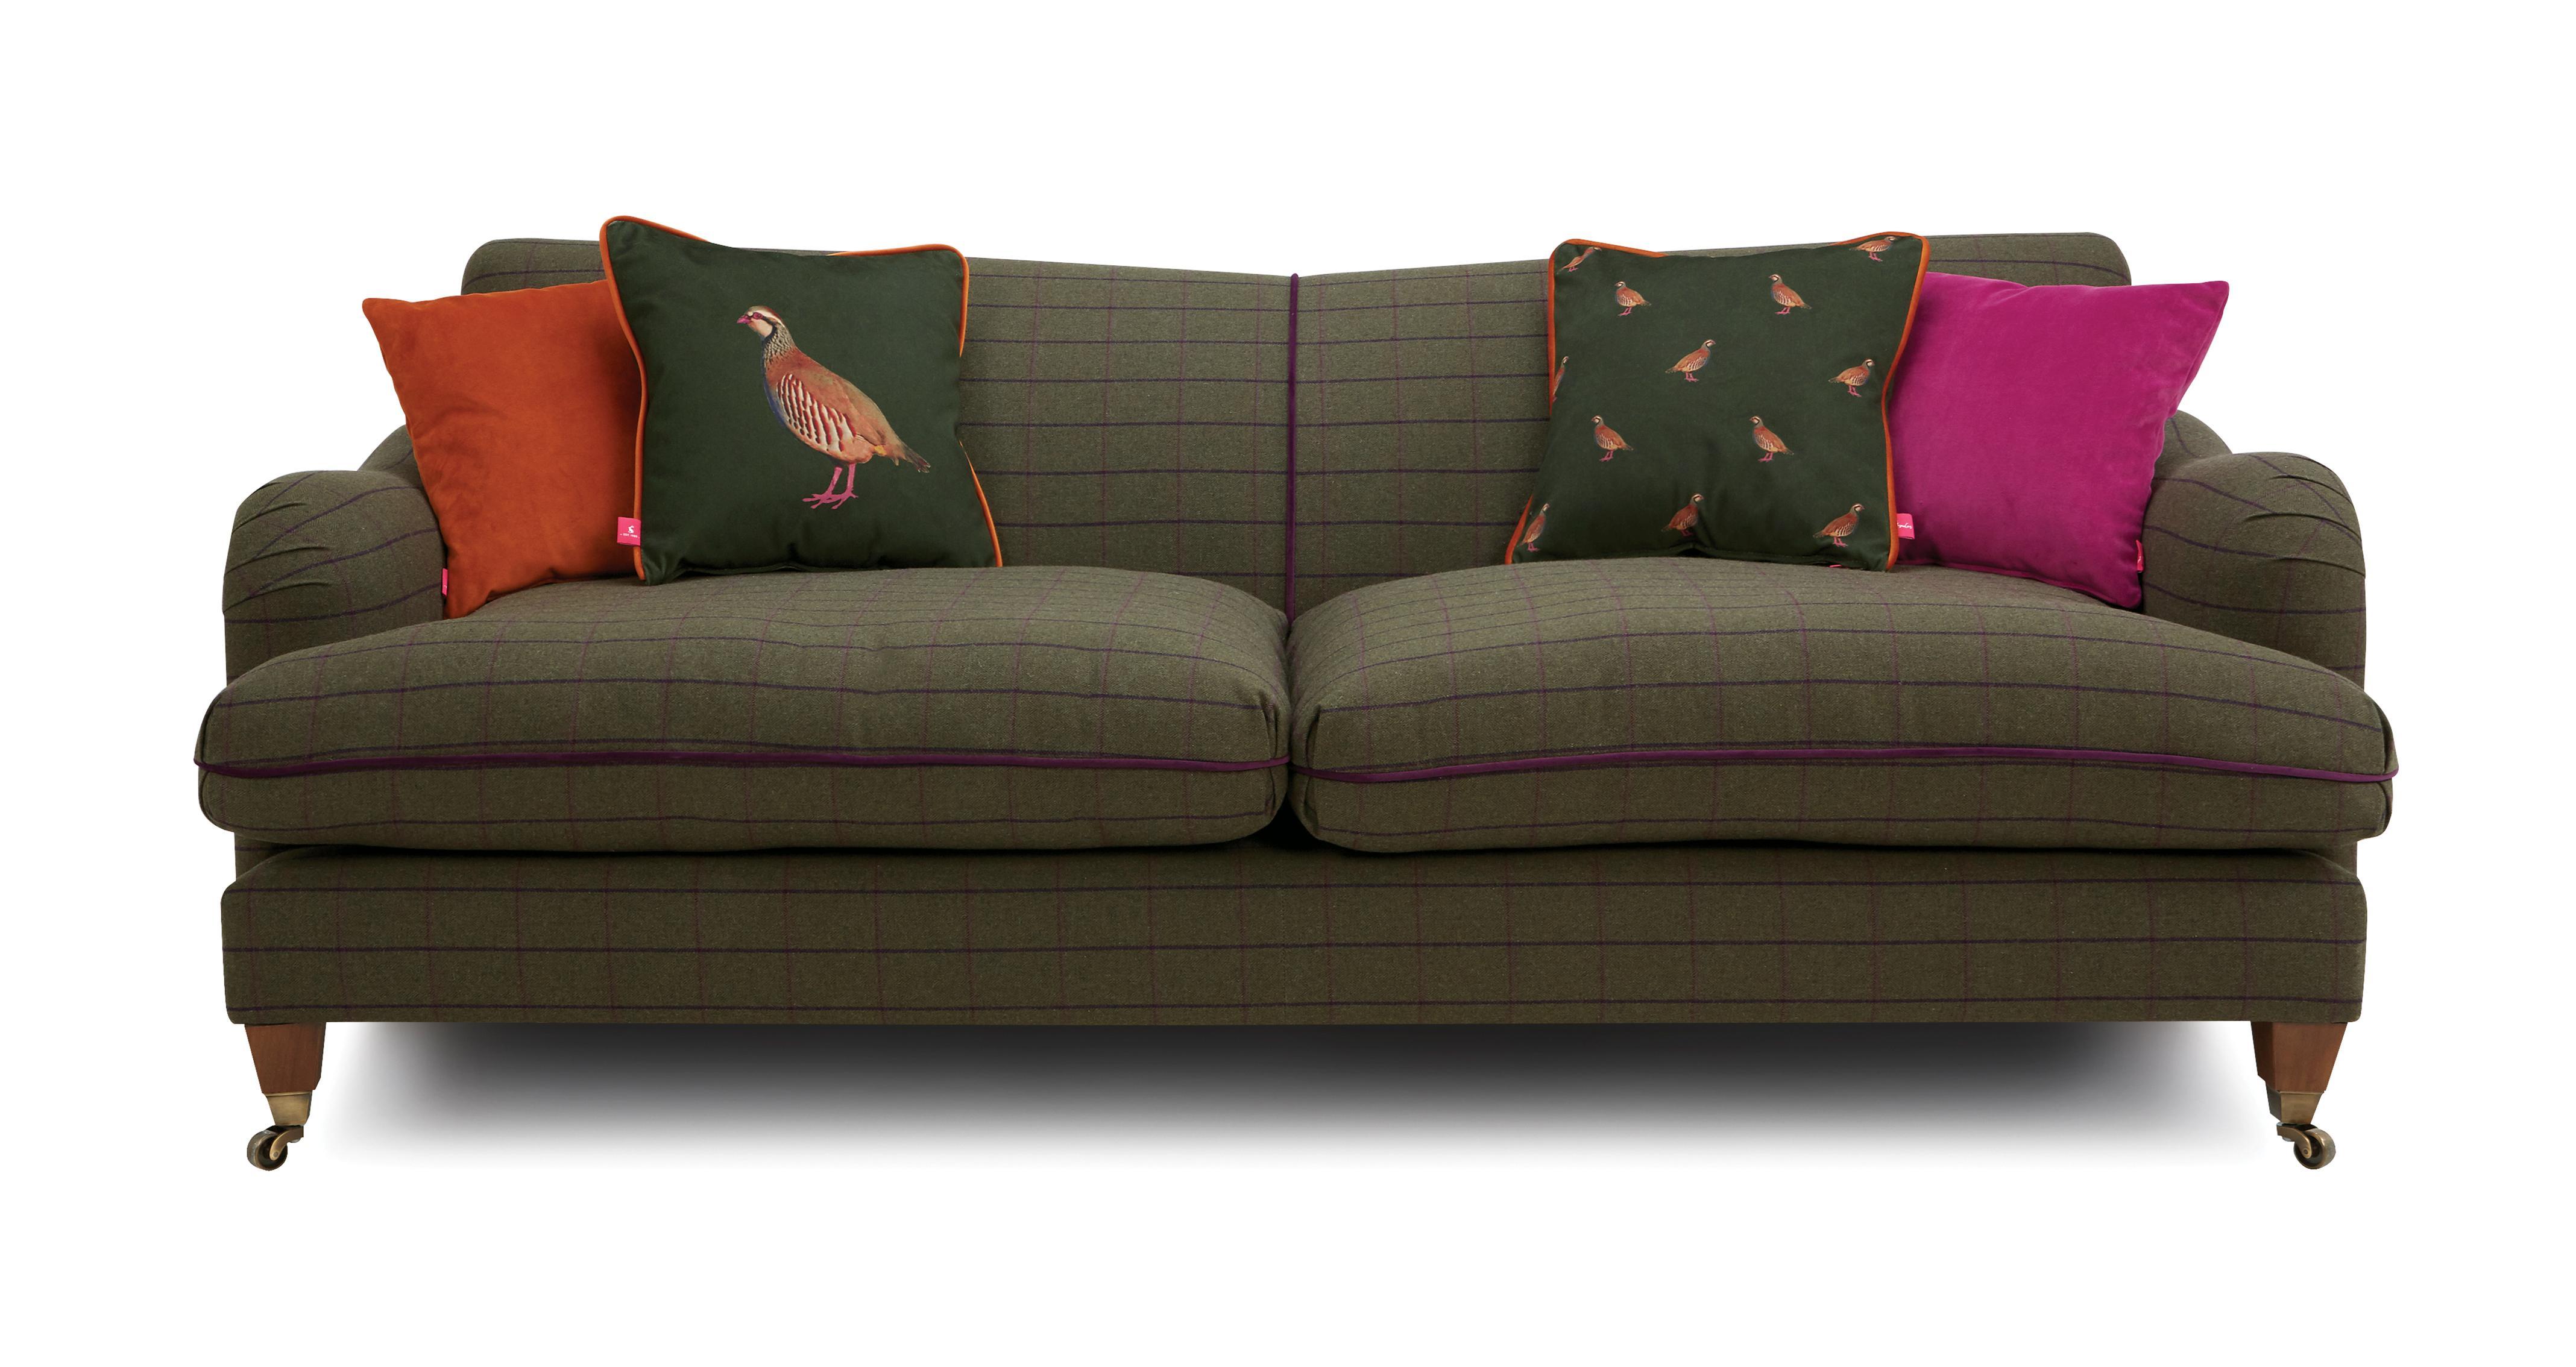 Ilkley Tweed 4 Seater Sofa Heritage Tweed Dfs Ireland